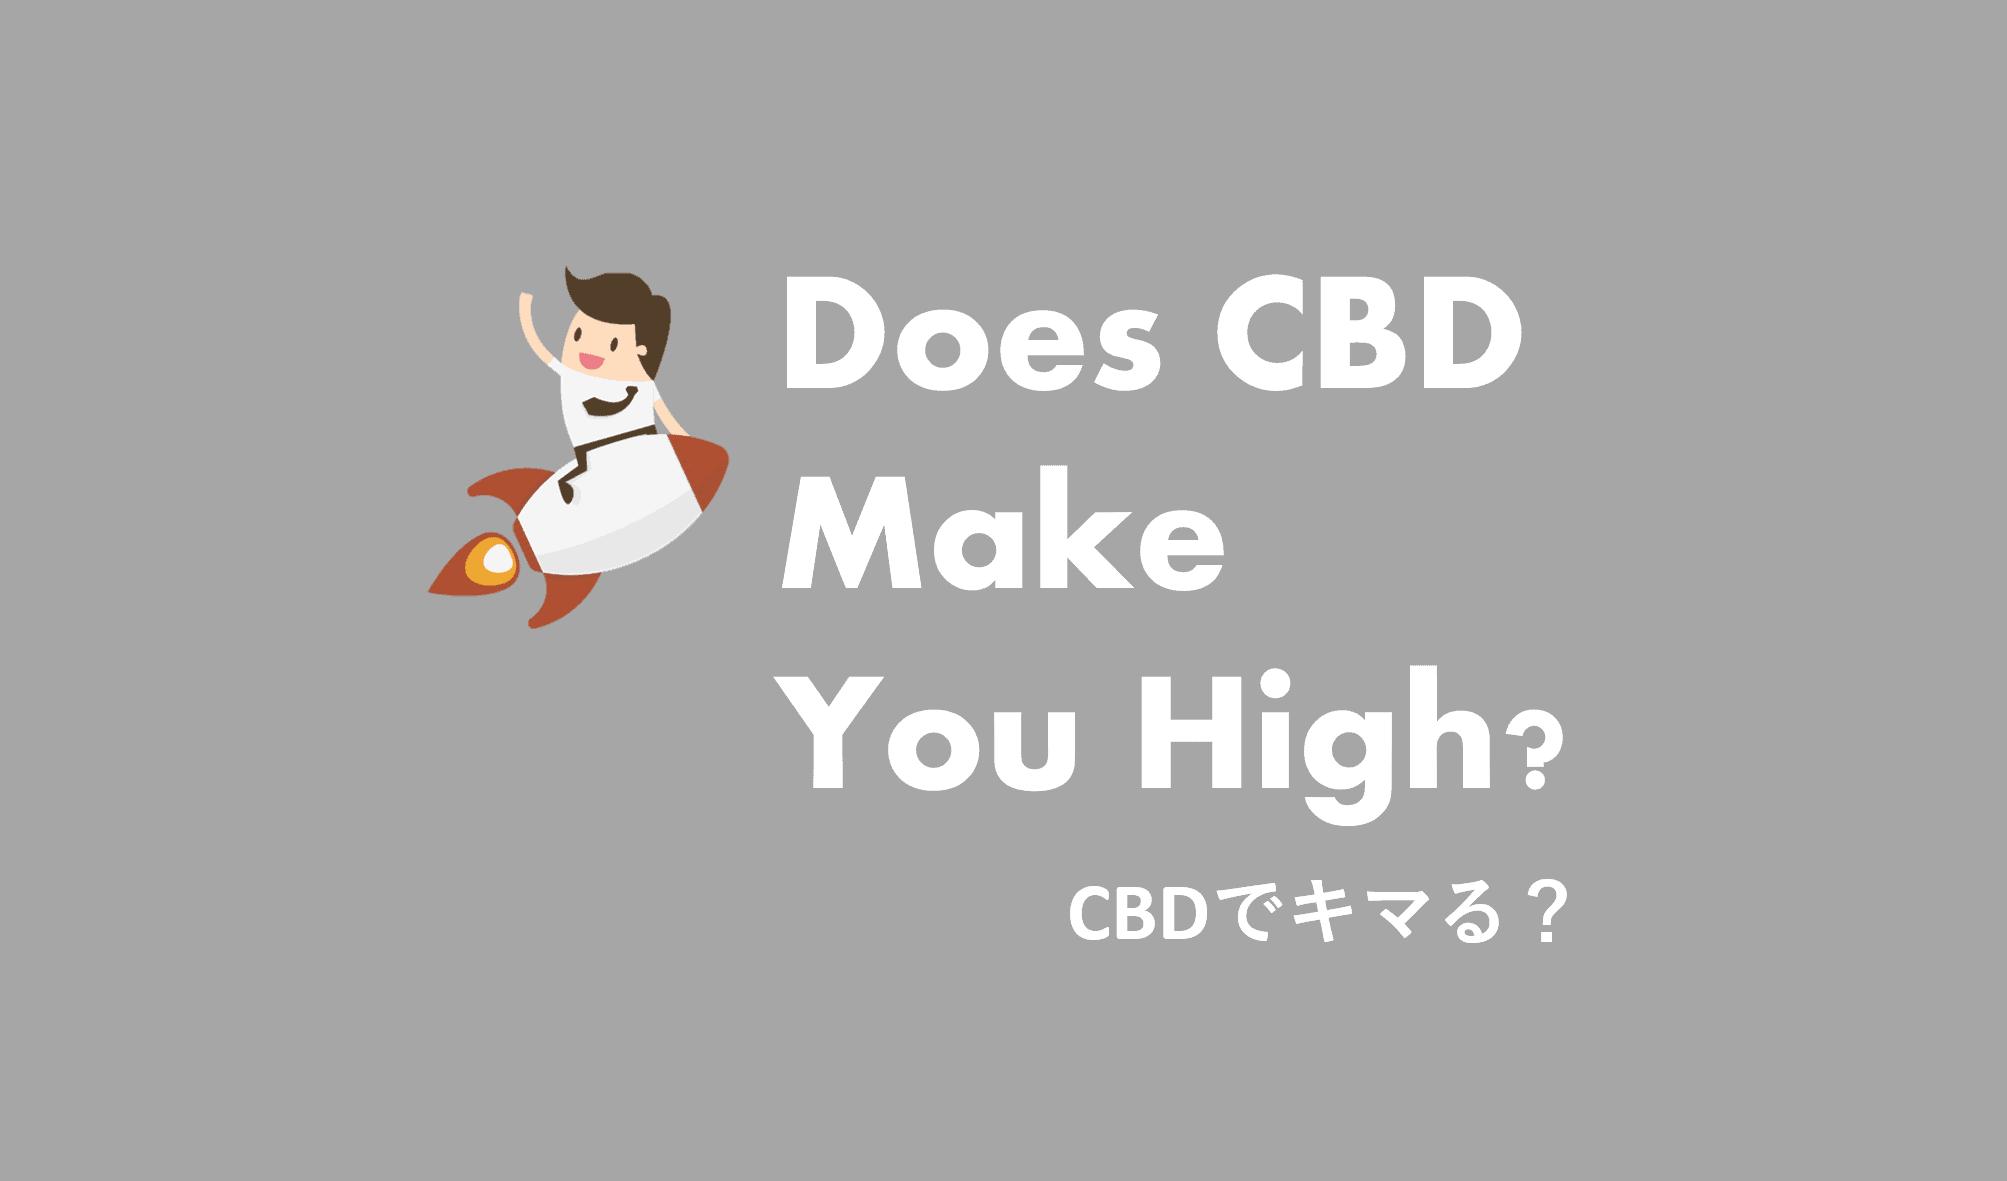 CBDで「キマる」?実は精神作用があるCBD